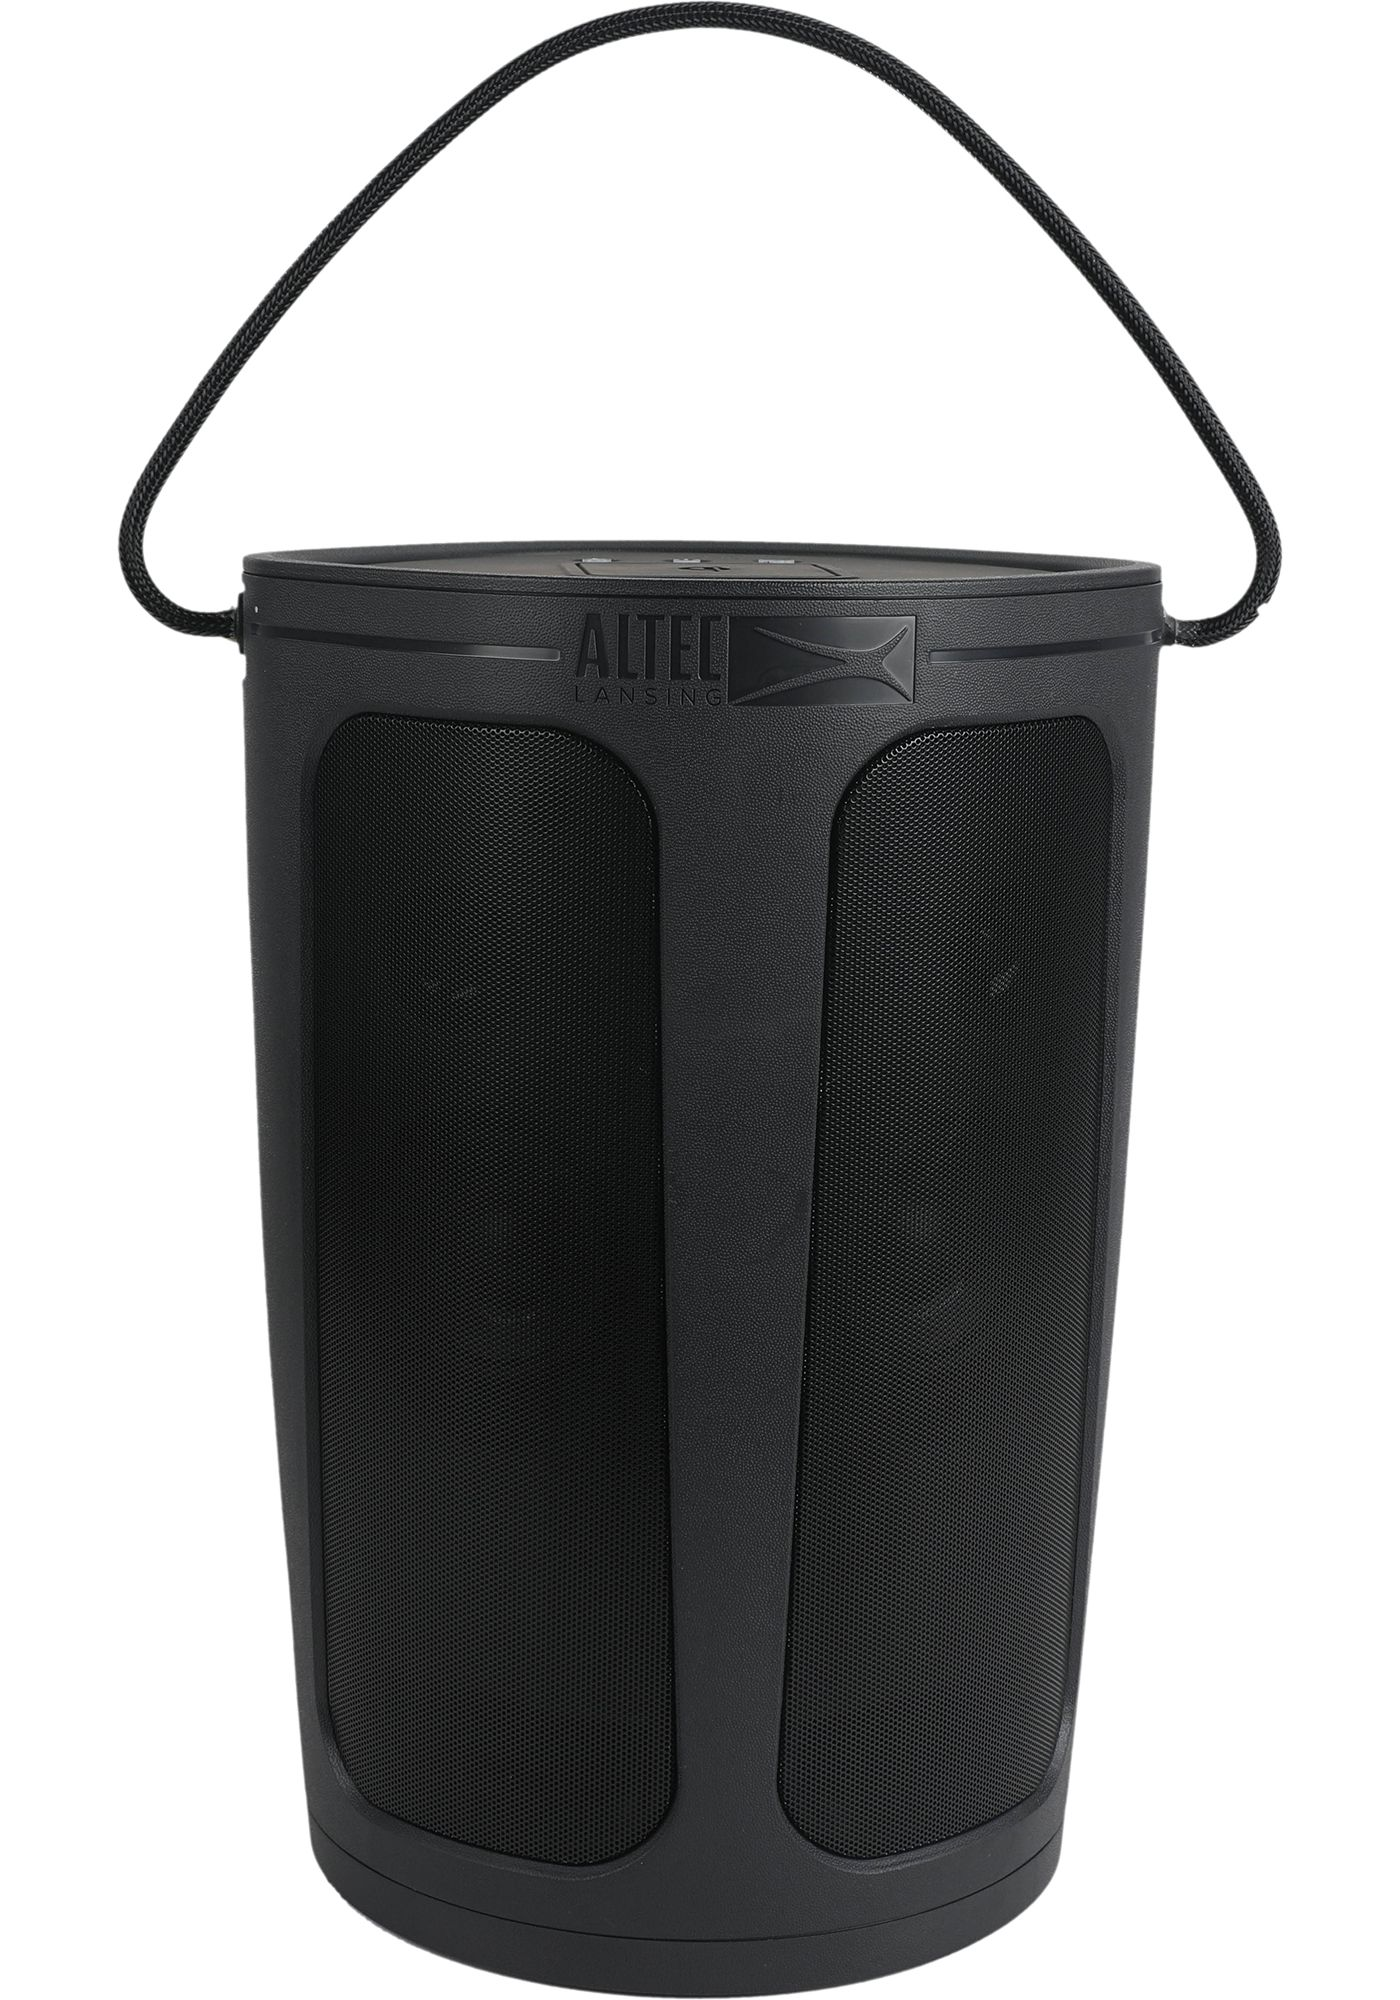 Altec Lansing SoundBucket XL Portable Speaker